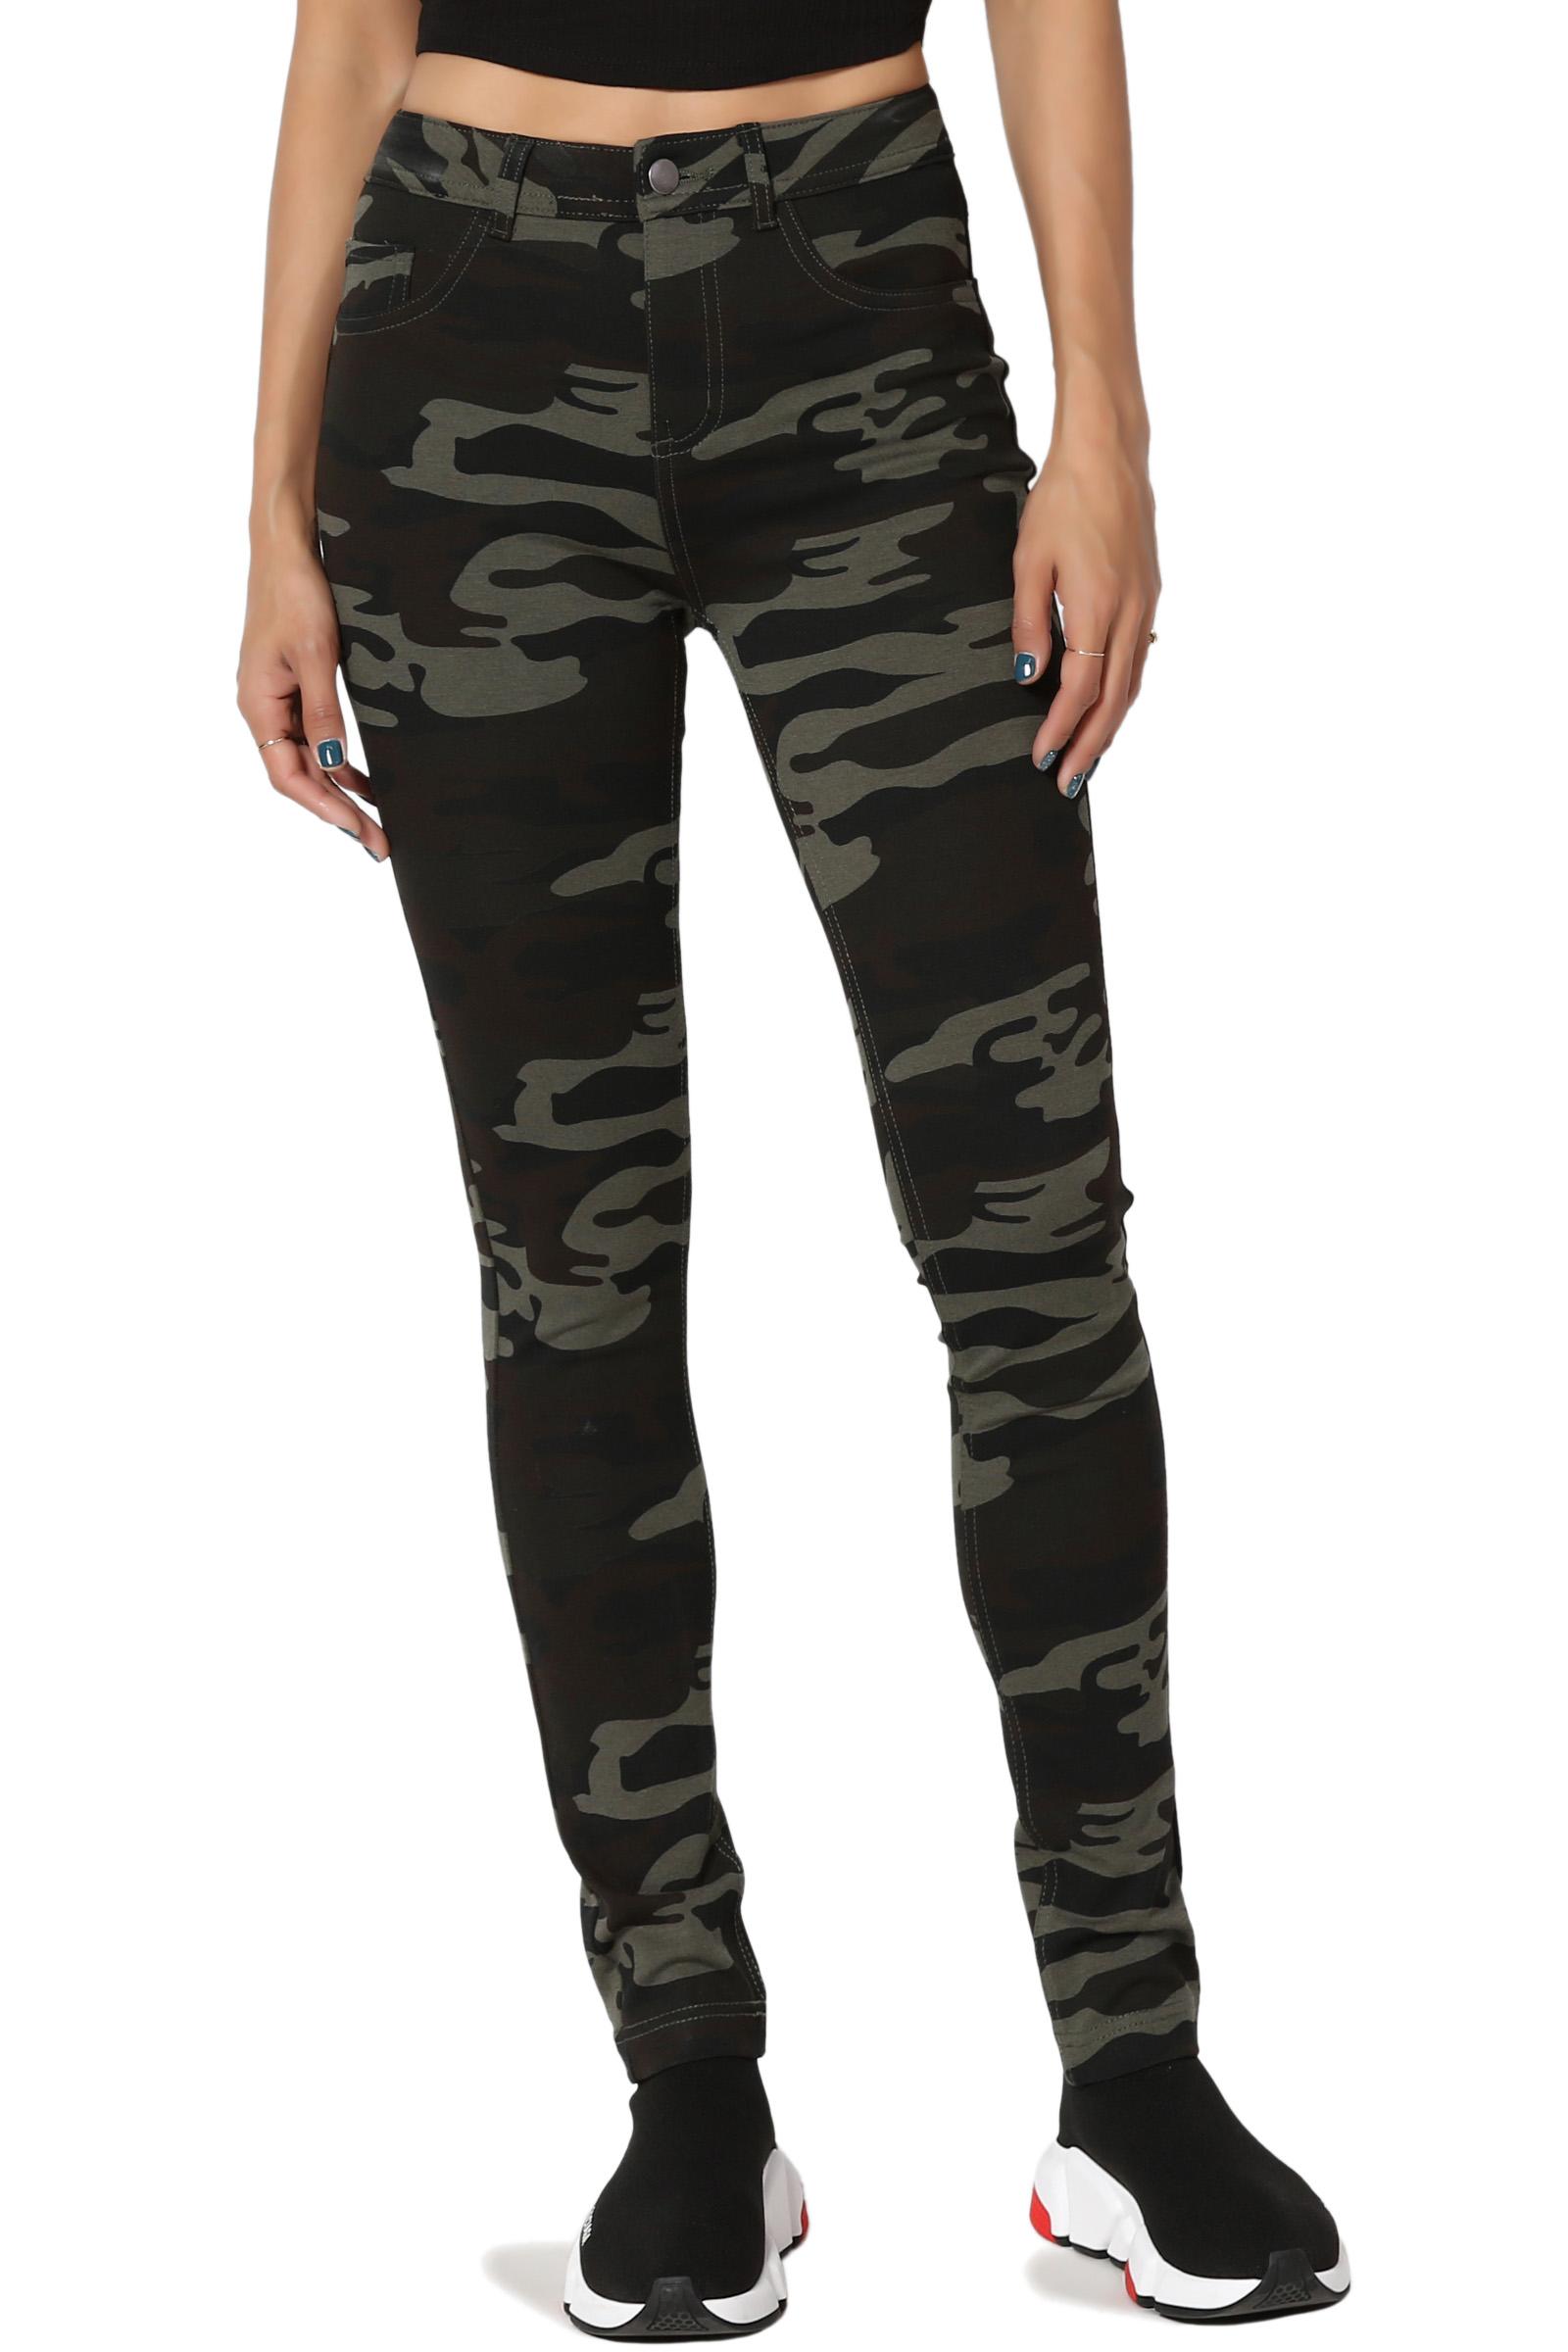 TheMogan Junior's Camo Military Print Stretch Ponte Knit High Waist Skinny Pants